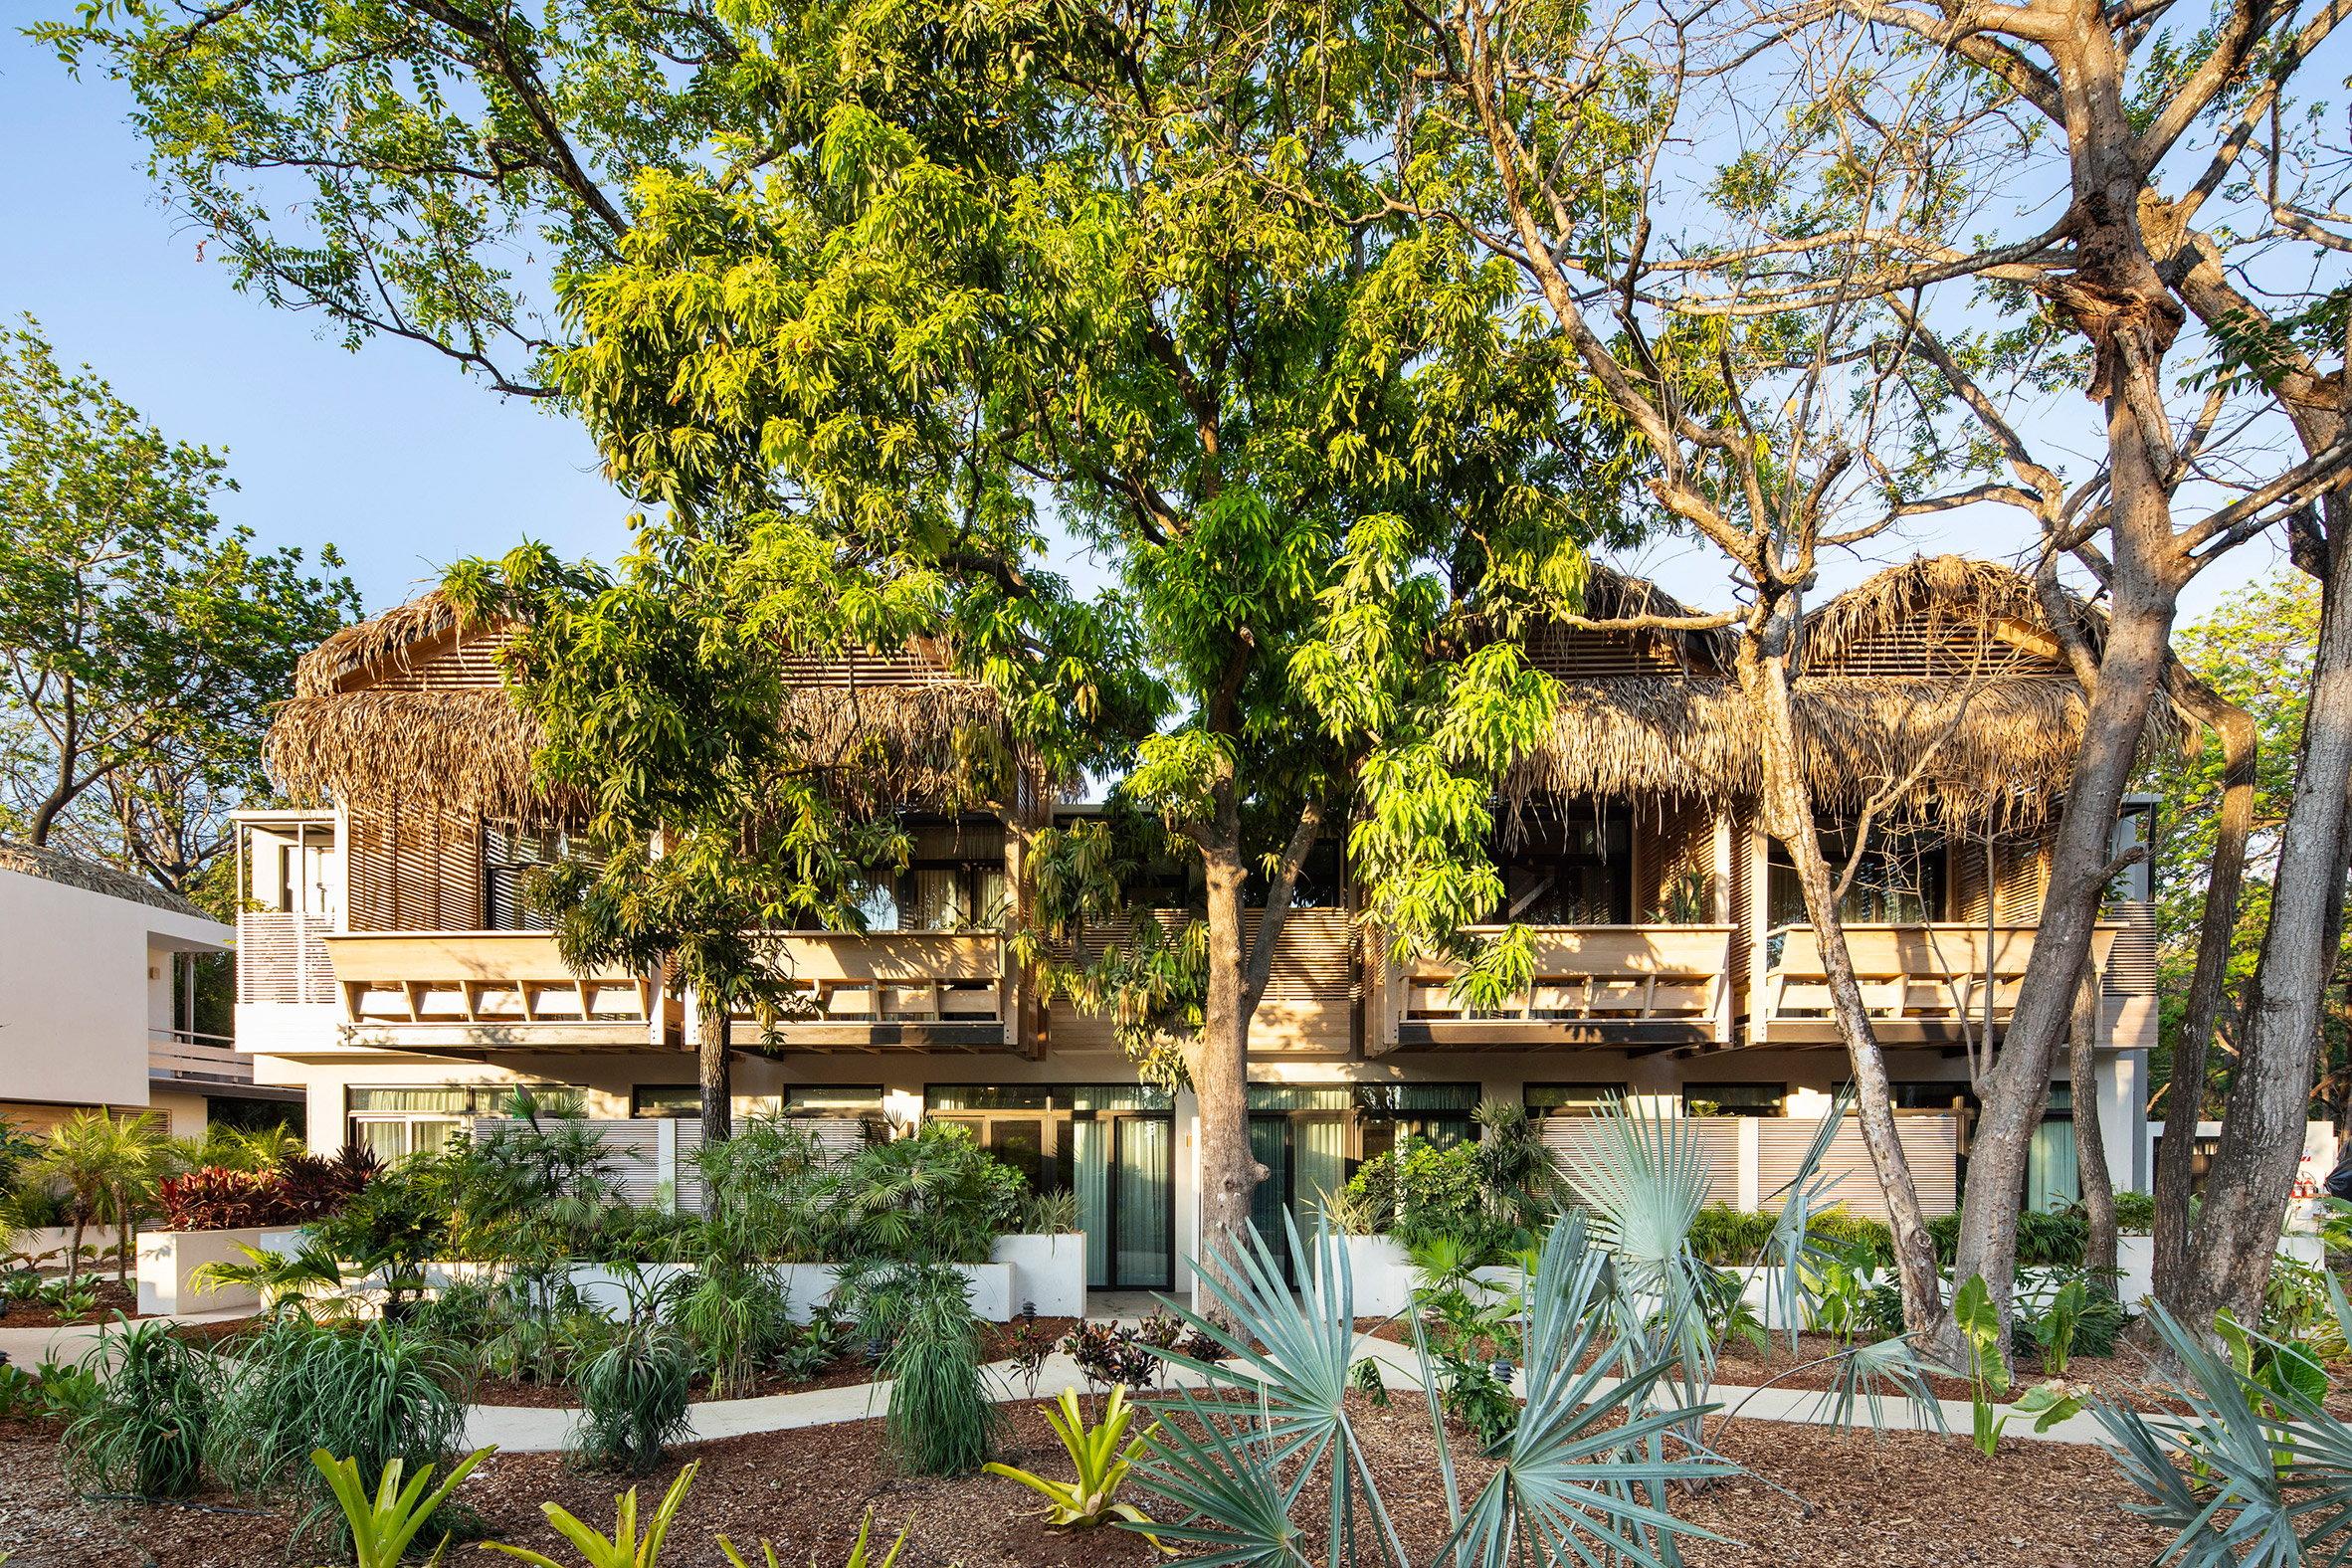 Studio Saxe transforms Costa Rican lodge into The Gilded Iguana surf resort